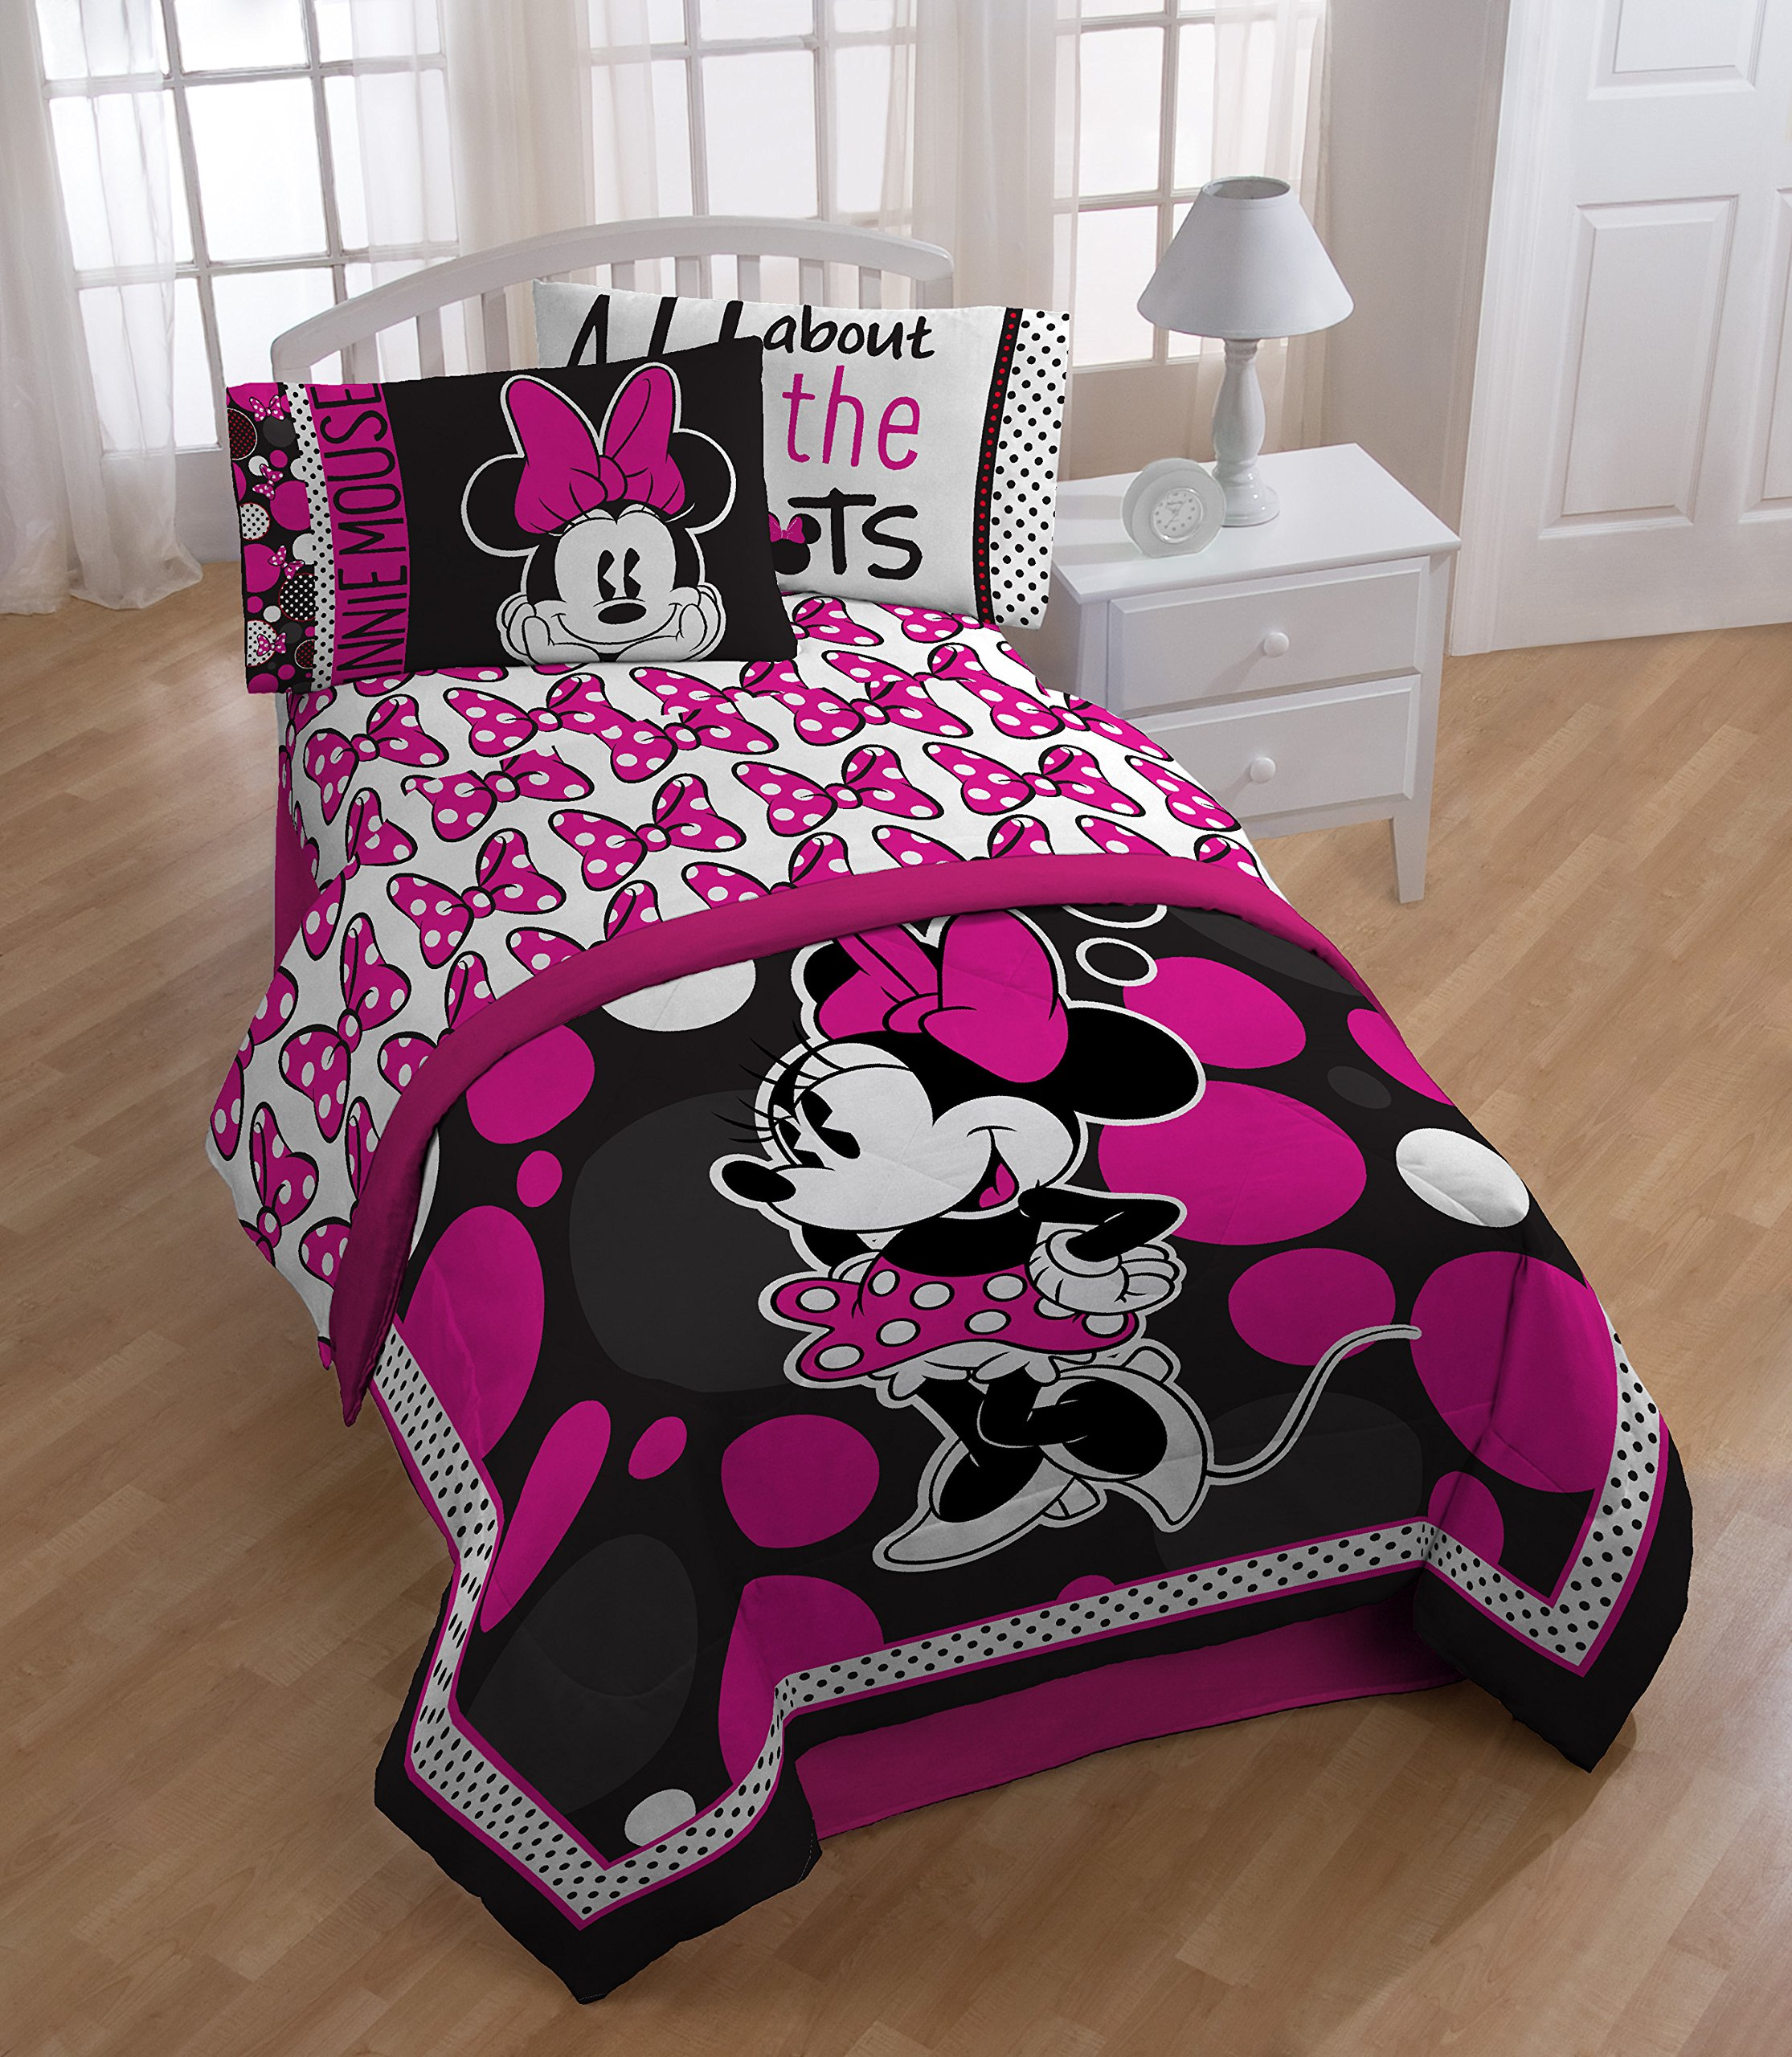 Disney Minnie Mouse Rock The Dots Microfiber Full 4 Piece Sheet Set by Disney